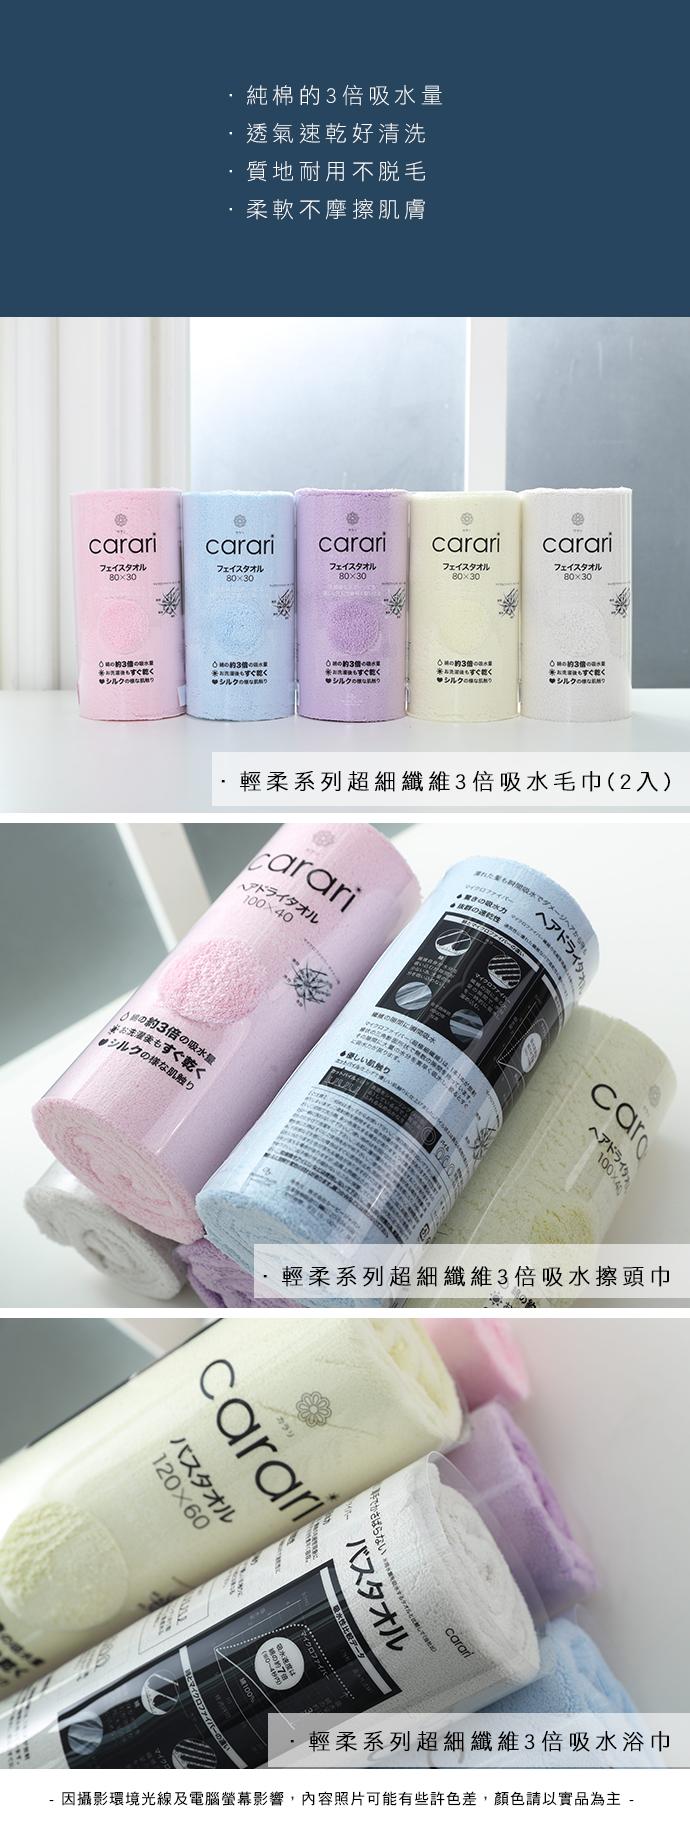 CB Japan|輕柔系列超細纖維3倍吸水毛巾 (2入) - 甜心紫